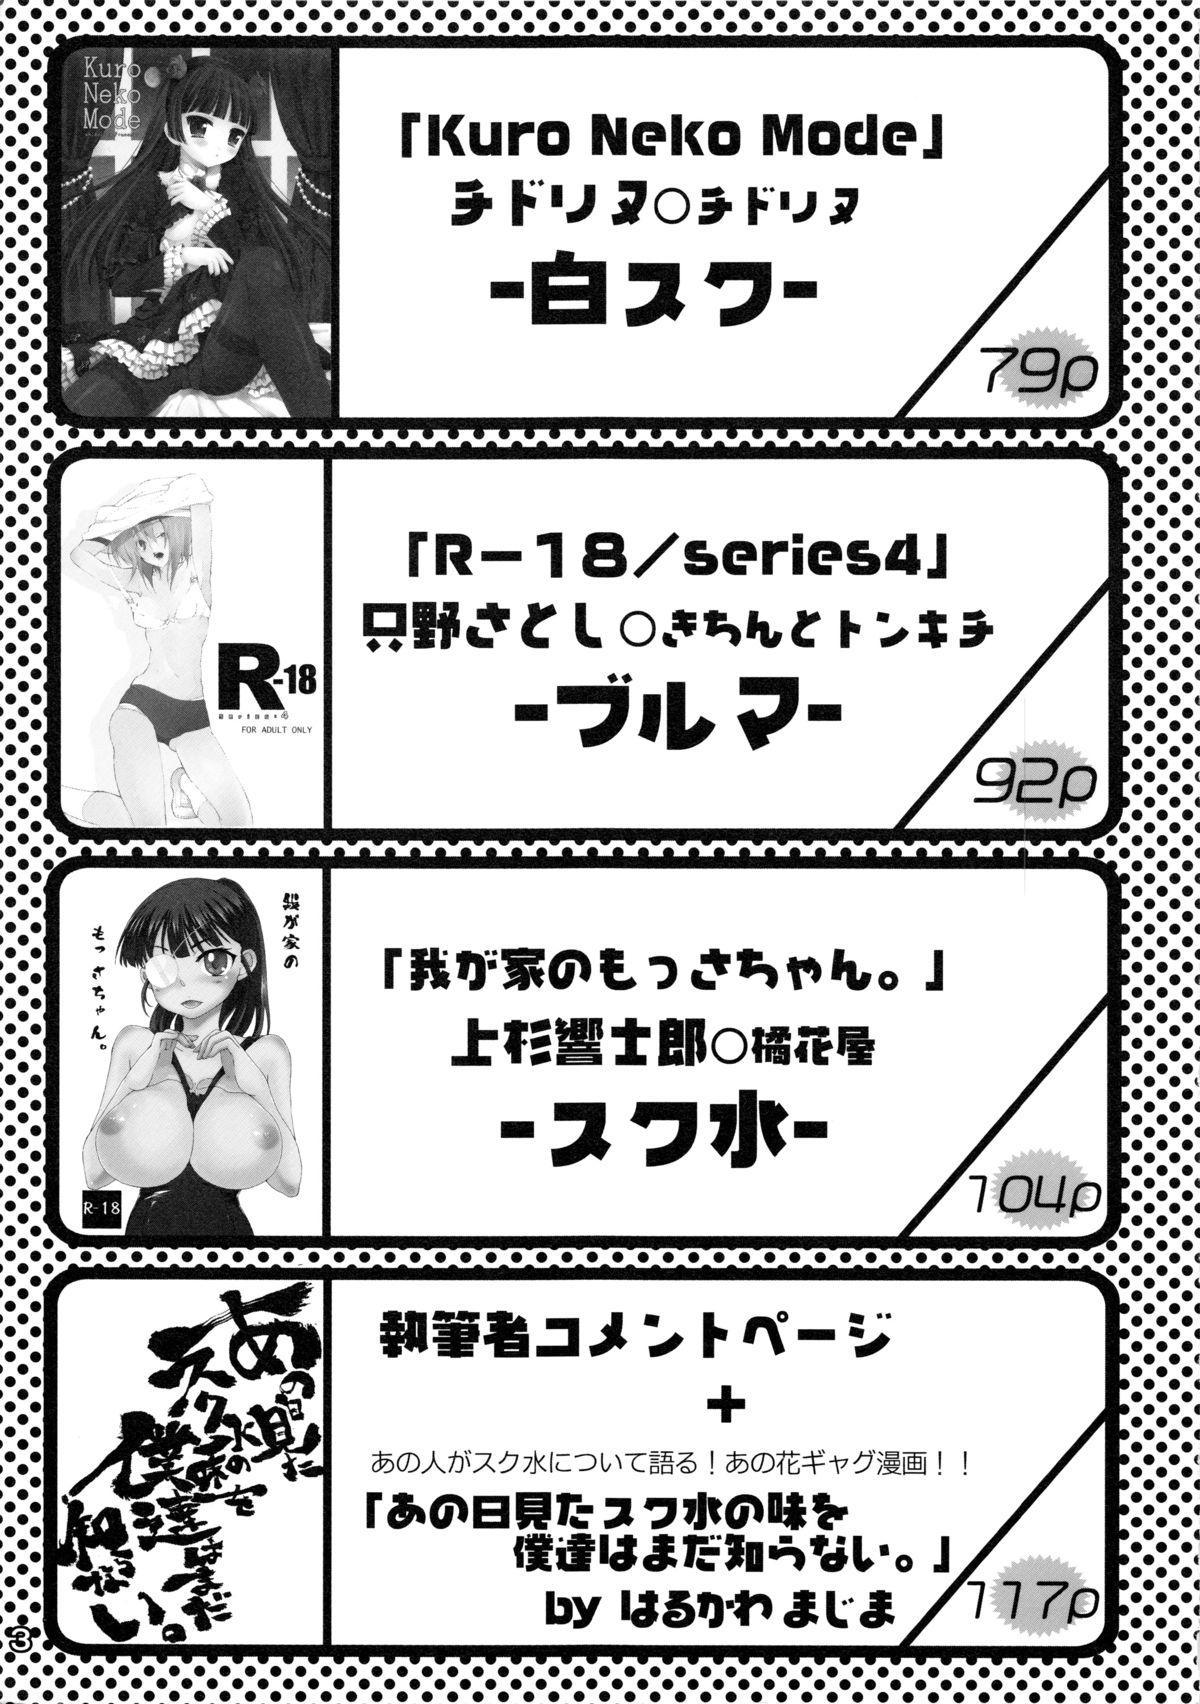 School-mer! School Mizugi Bloomer Joshi Anthology 3